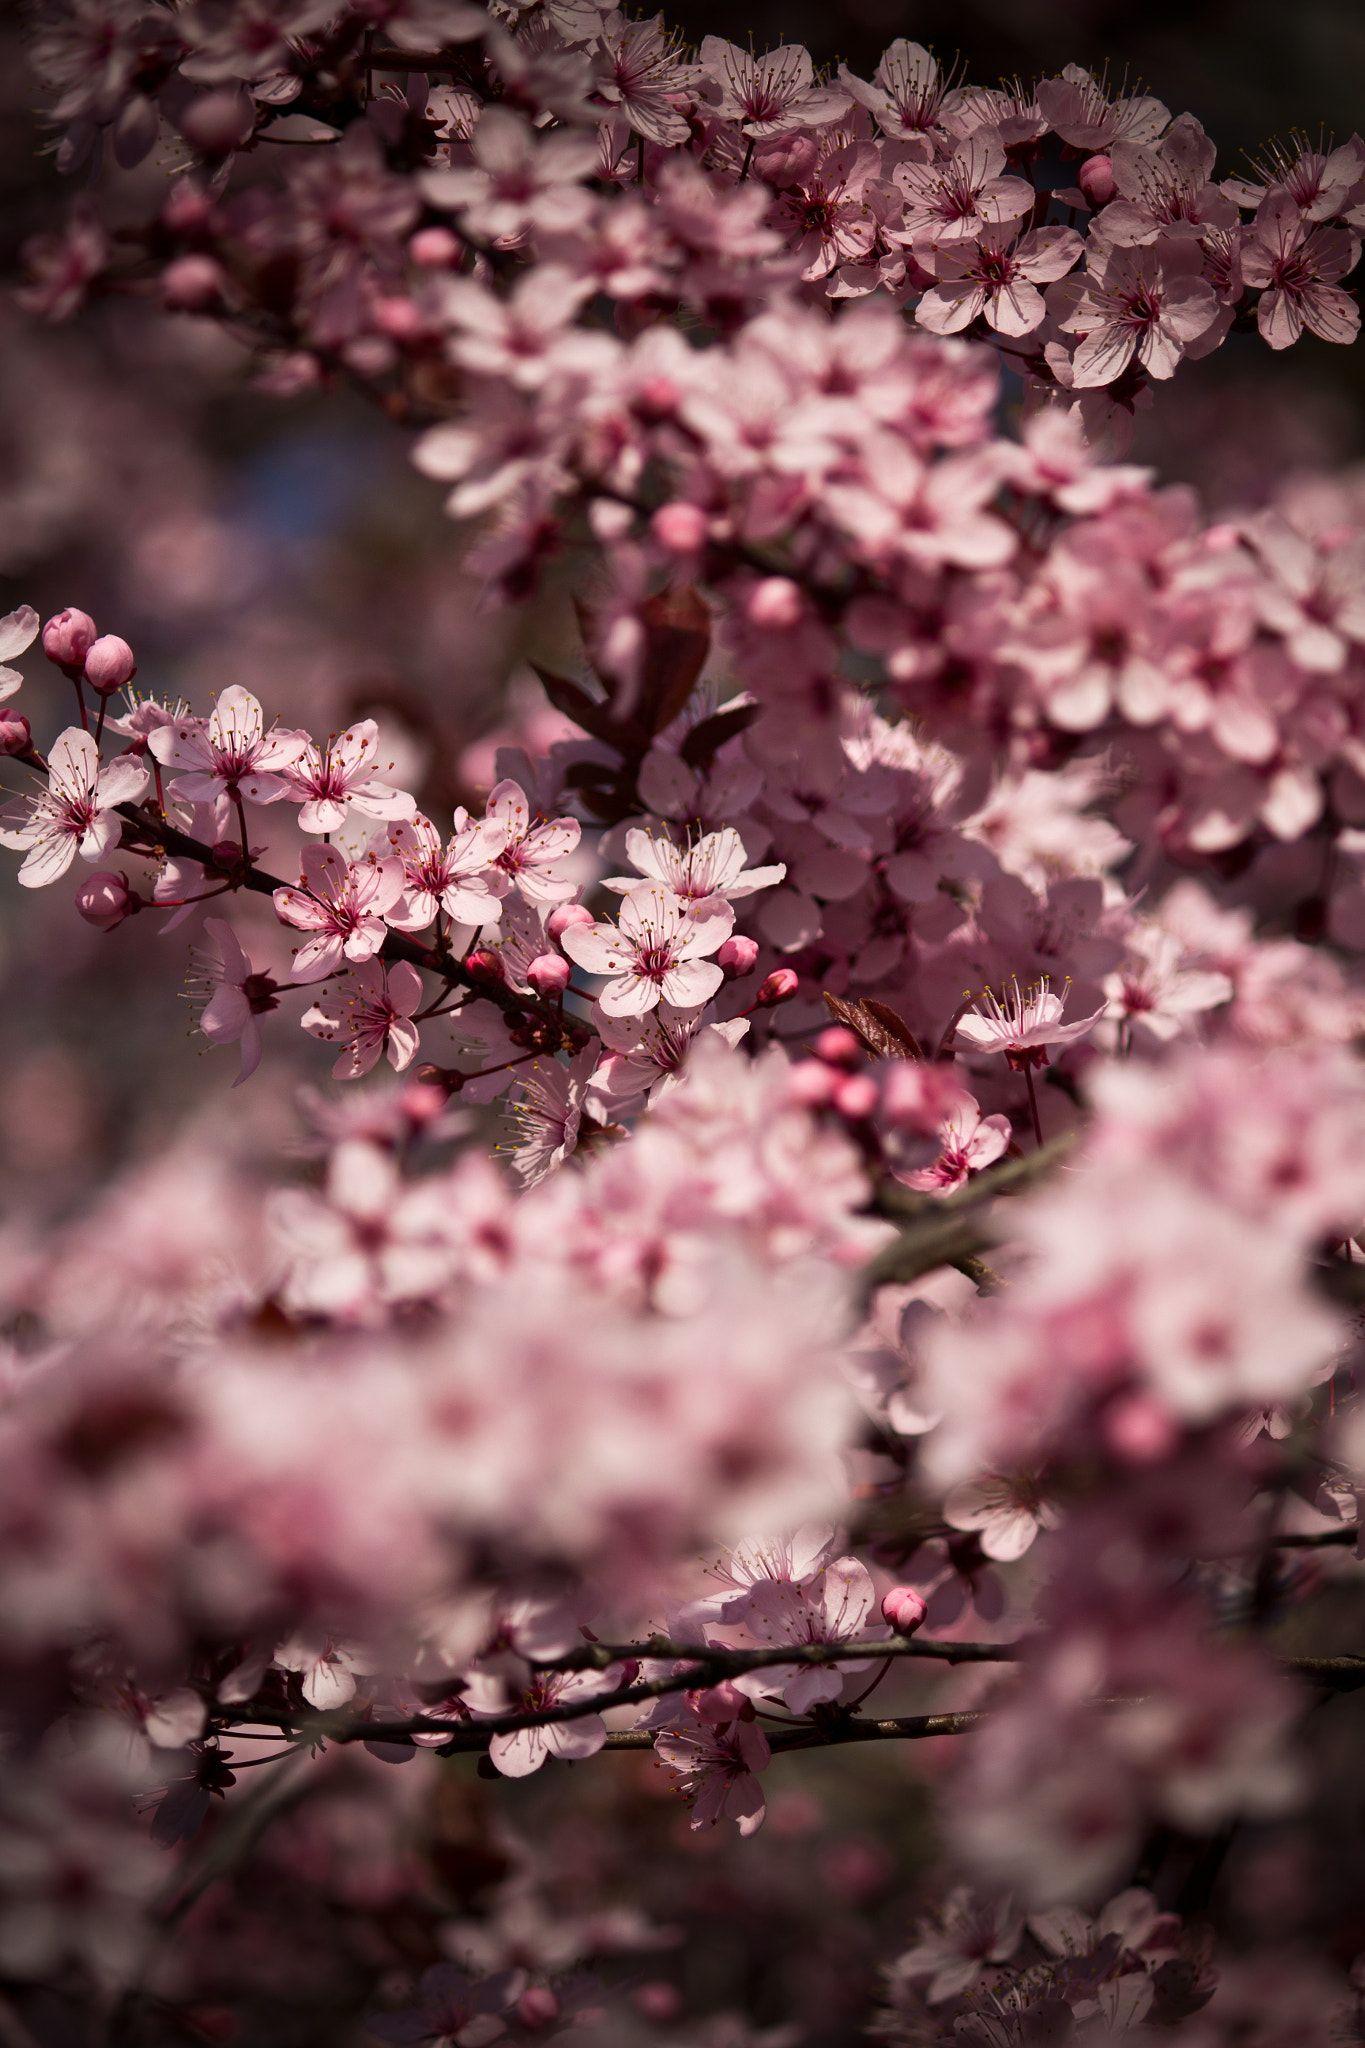 Cherry Blossom Cherry Blossom Tree Soft Bokeh Dark Colored Scene Cherry Blossom Wallpaper Cherry Blossom Japan Blossoms Art